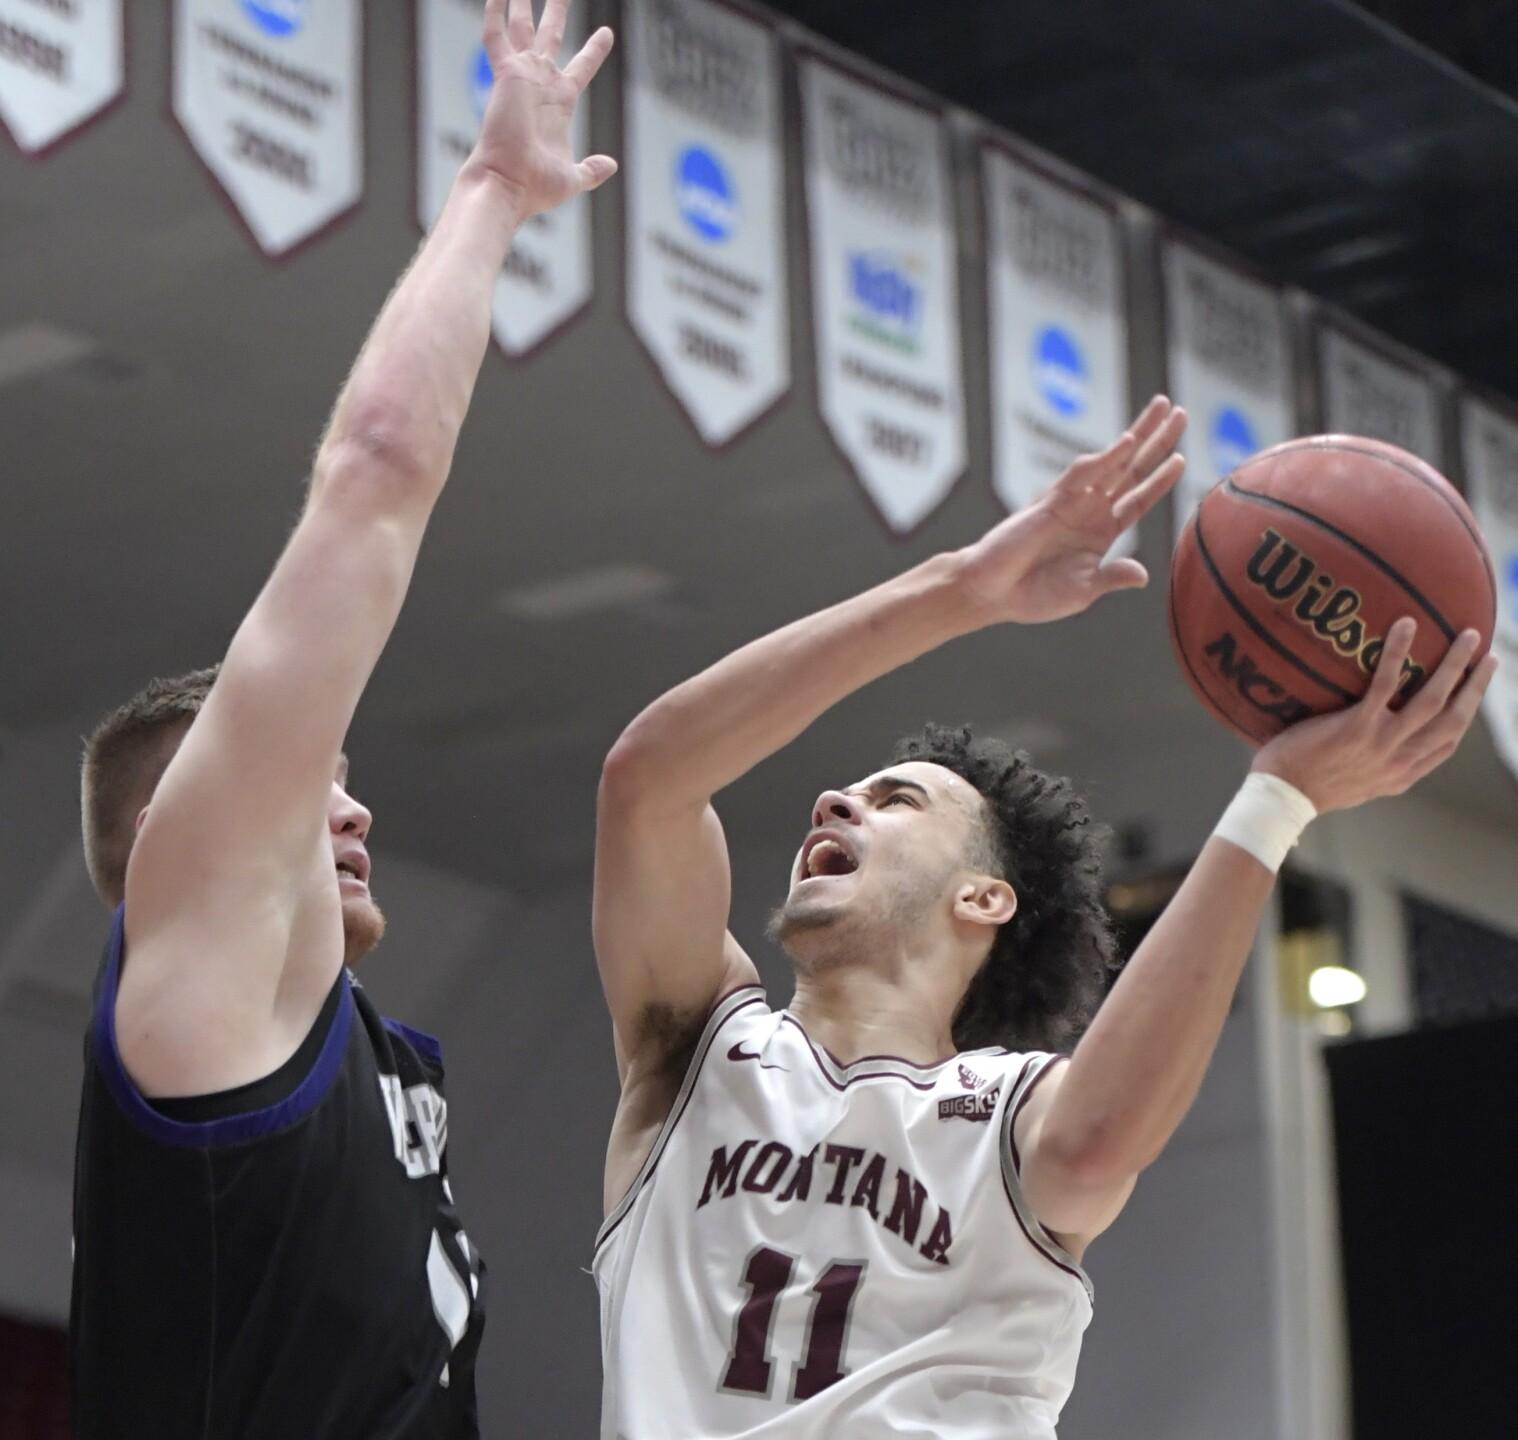 Montana beats Weber State 80-67